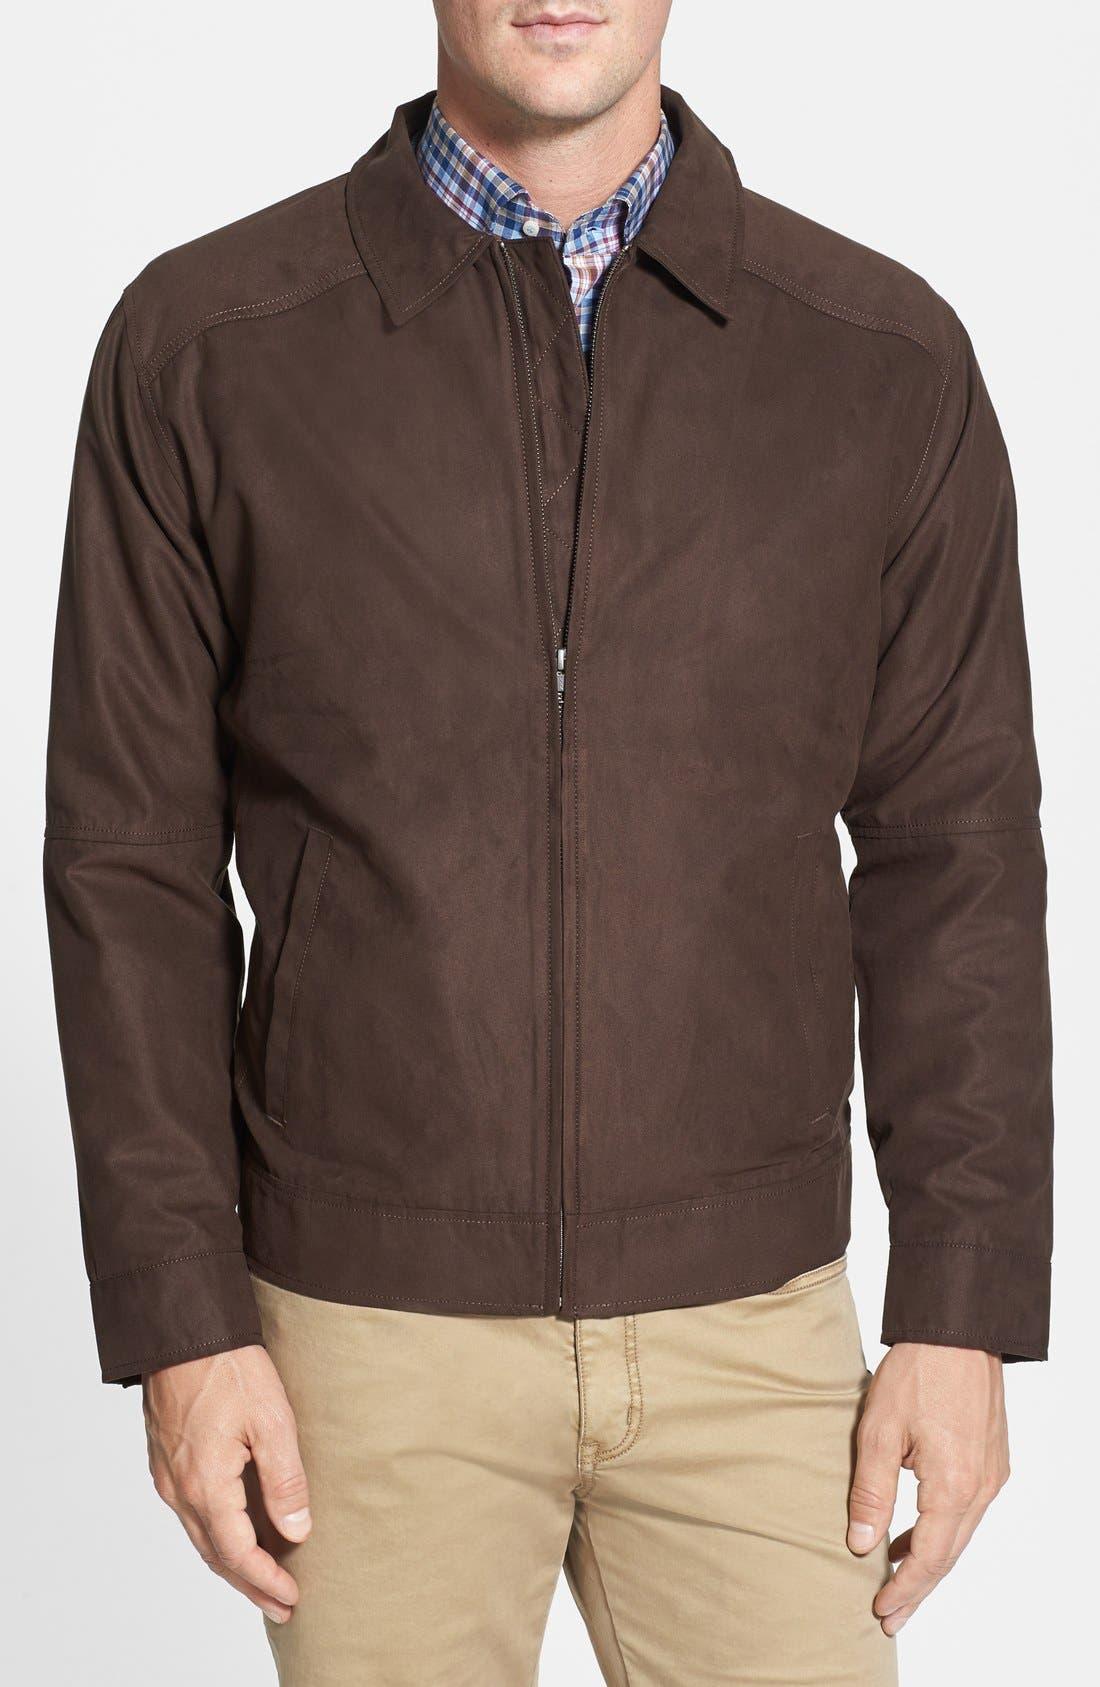 Roosevelt Water Resistant Full Zip Jacket,                         Main,                         color, Bittersweet Brown